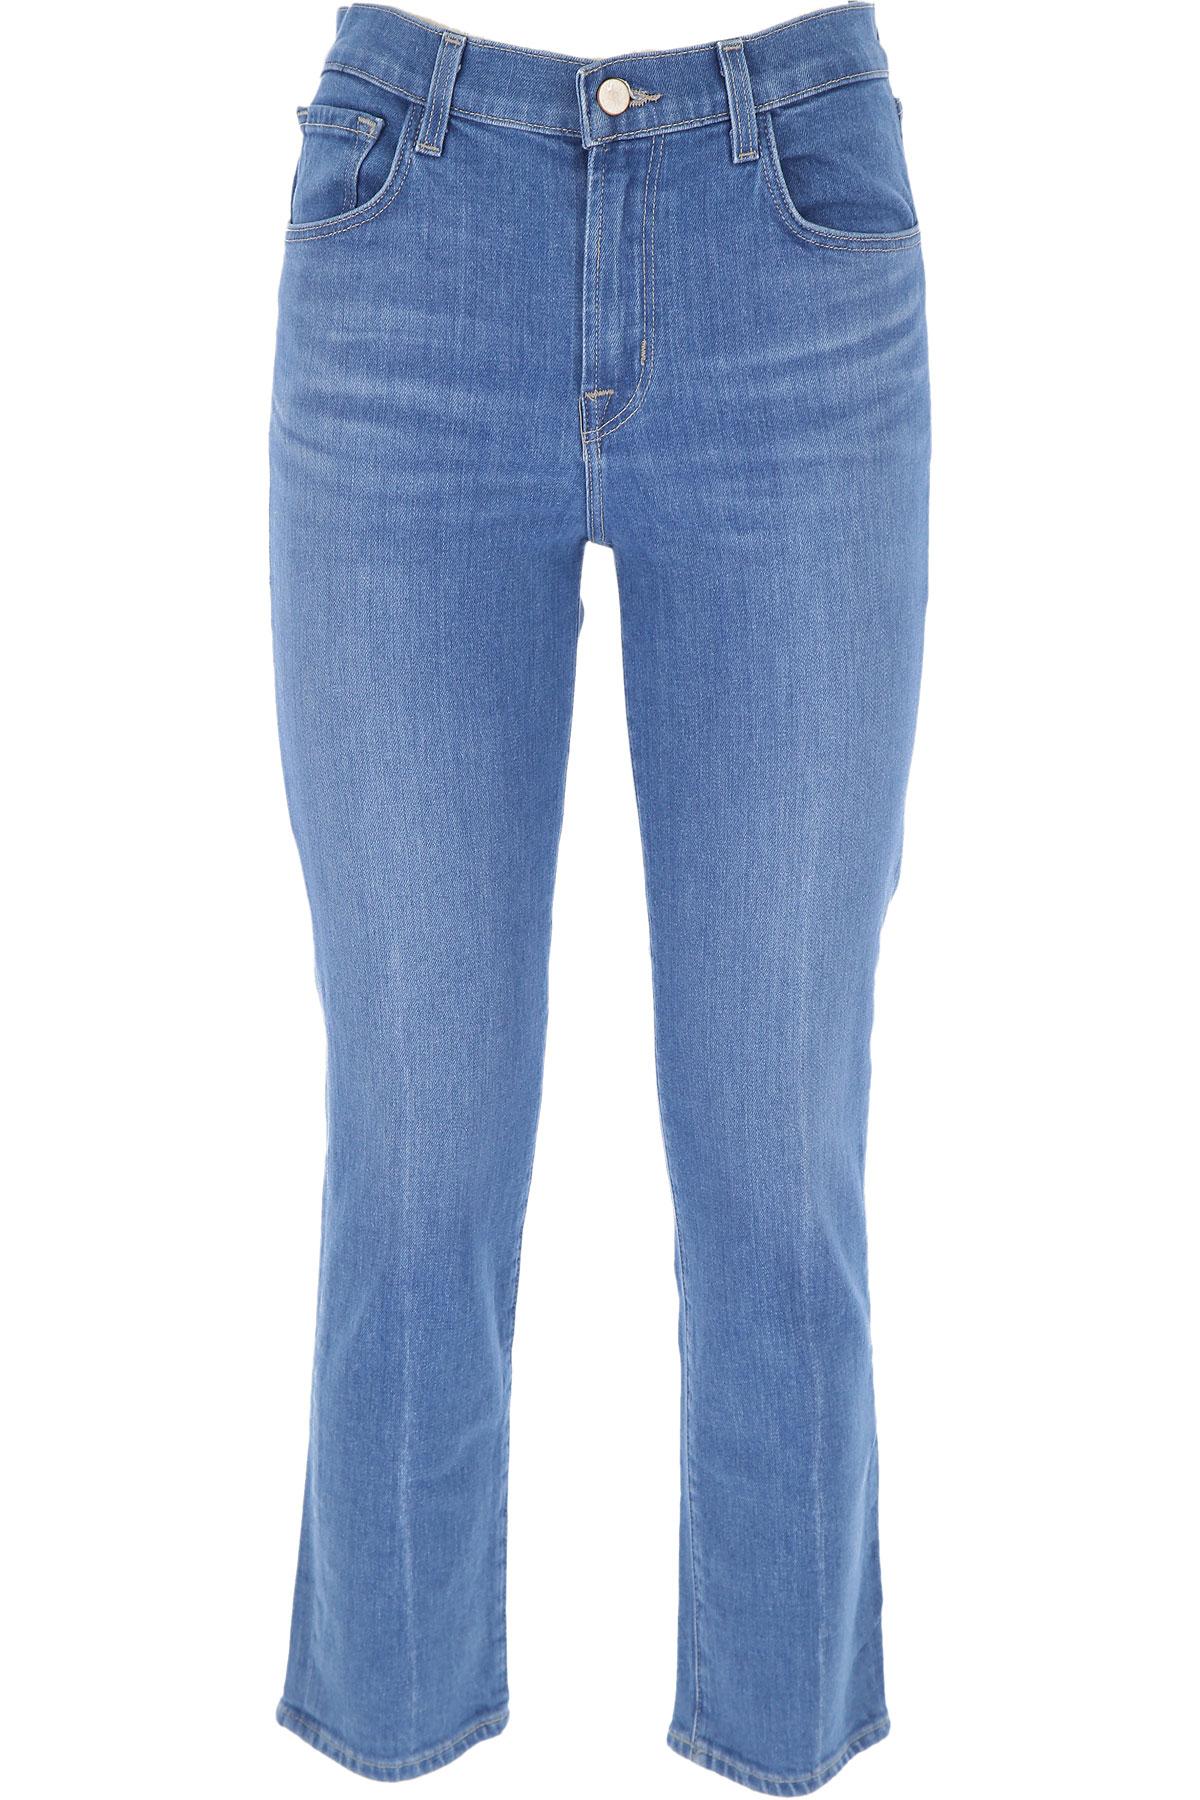 J Brand Jeans On Sale, Denim, Cotton, 2019, 24 28 29